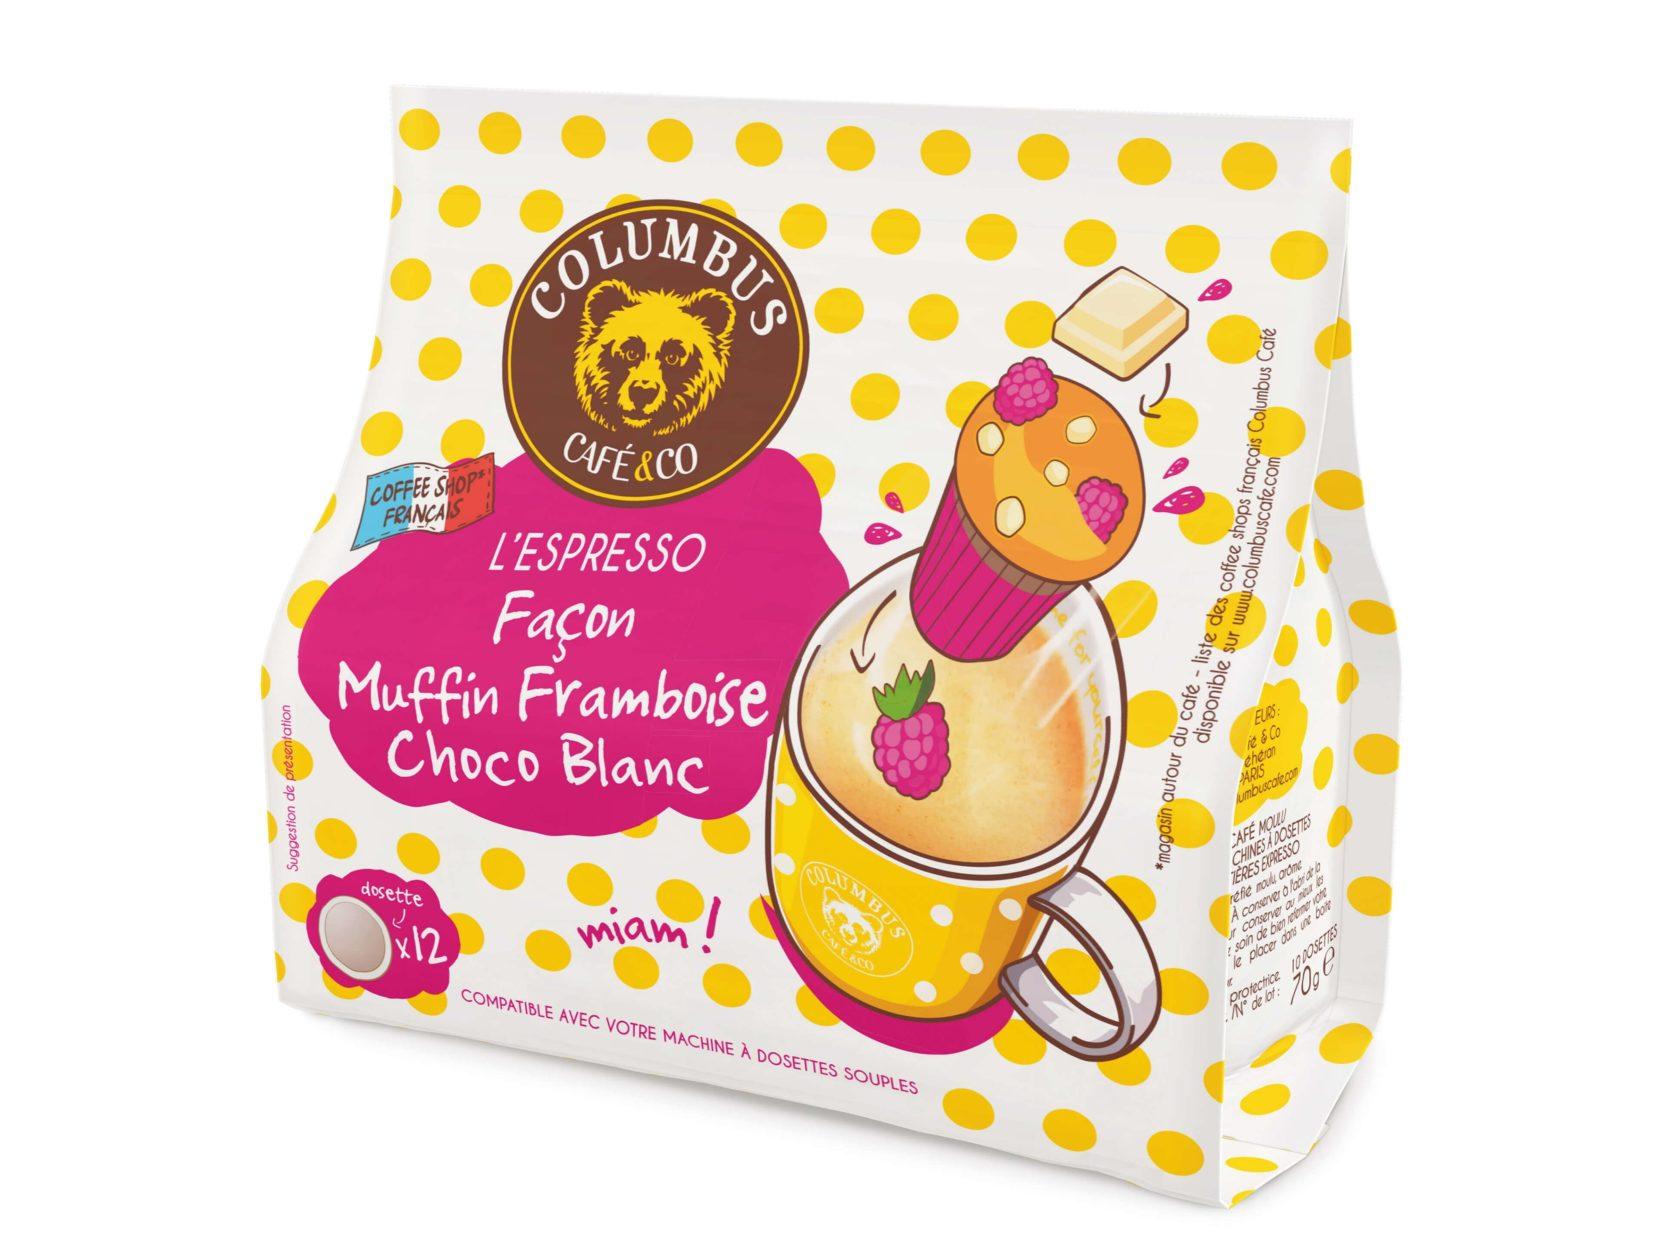 L'Espresso façon Muffin Framboise Choco blanc Senseo® x 12